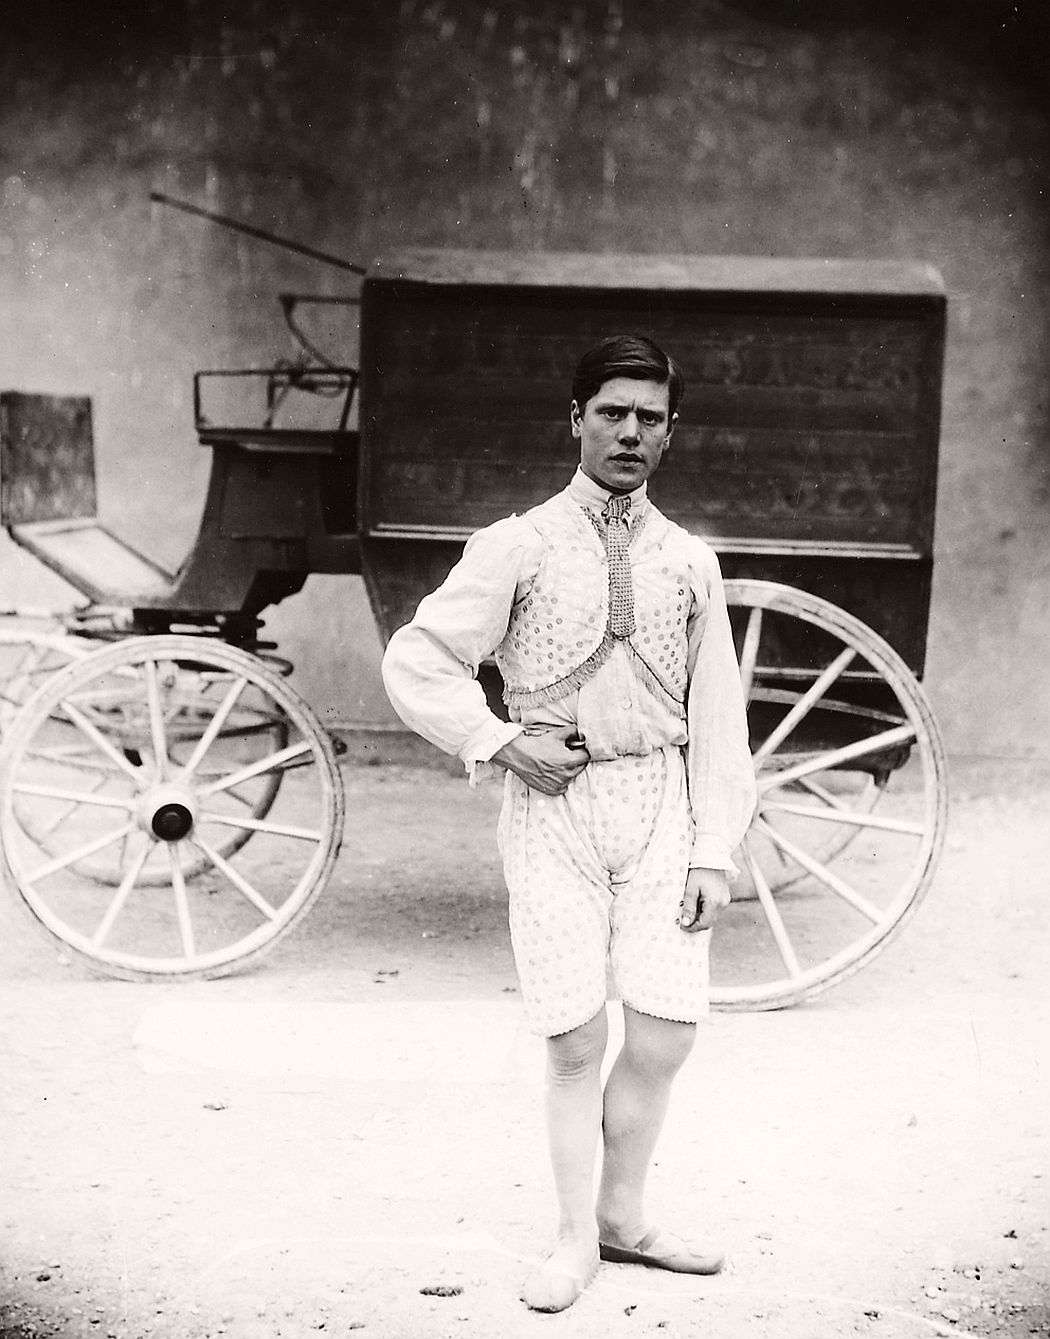 vintage-circus-performers-in-strabane-1910-1911-01